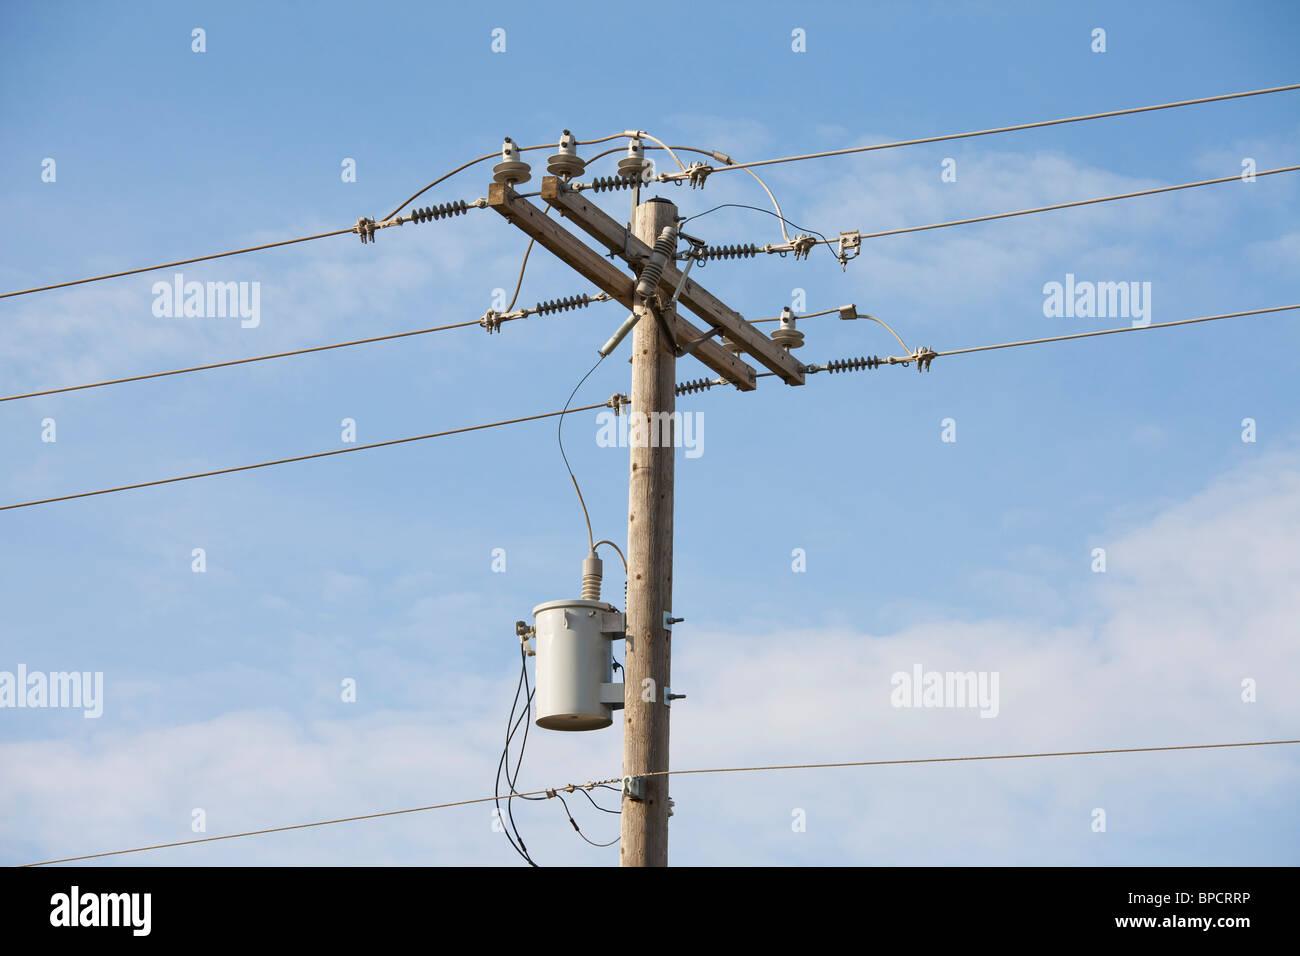 edmonton, alberta, canada; wooden power pole with a ...